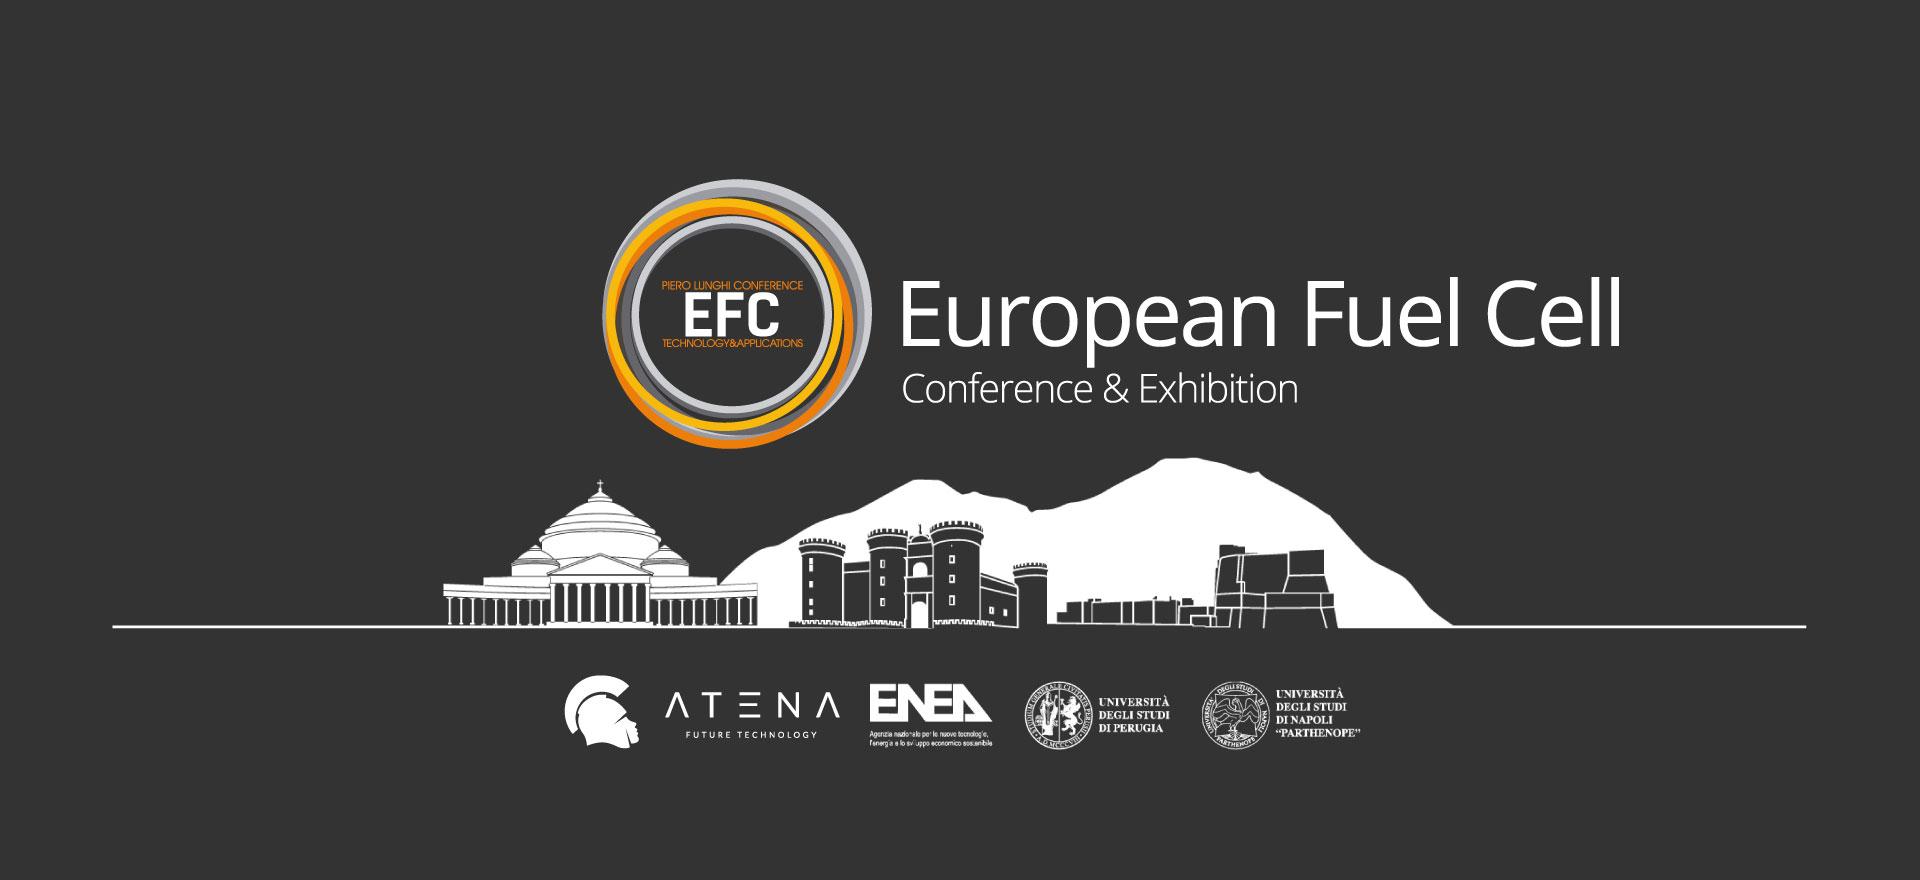 European Fuel Cell